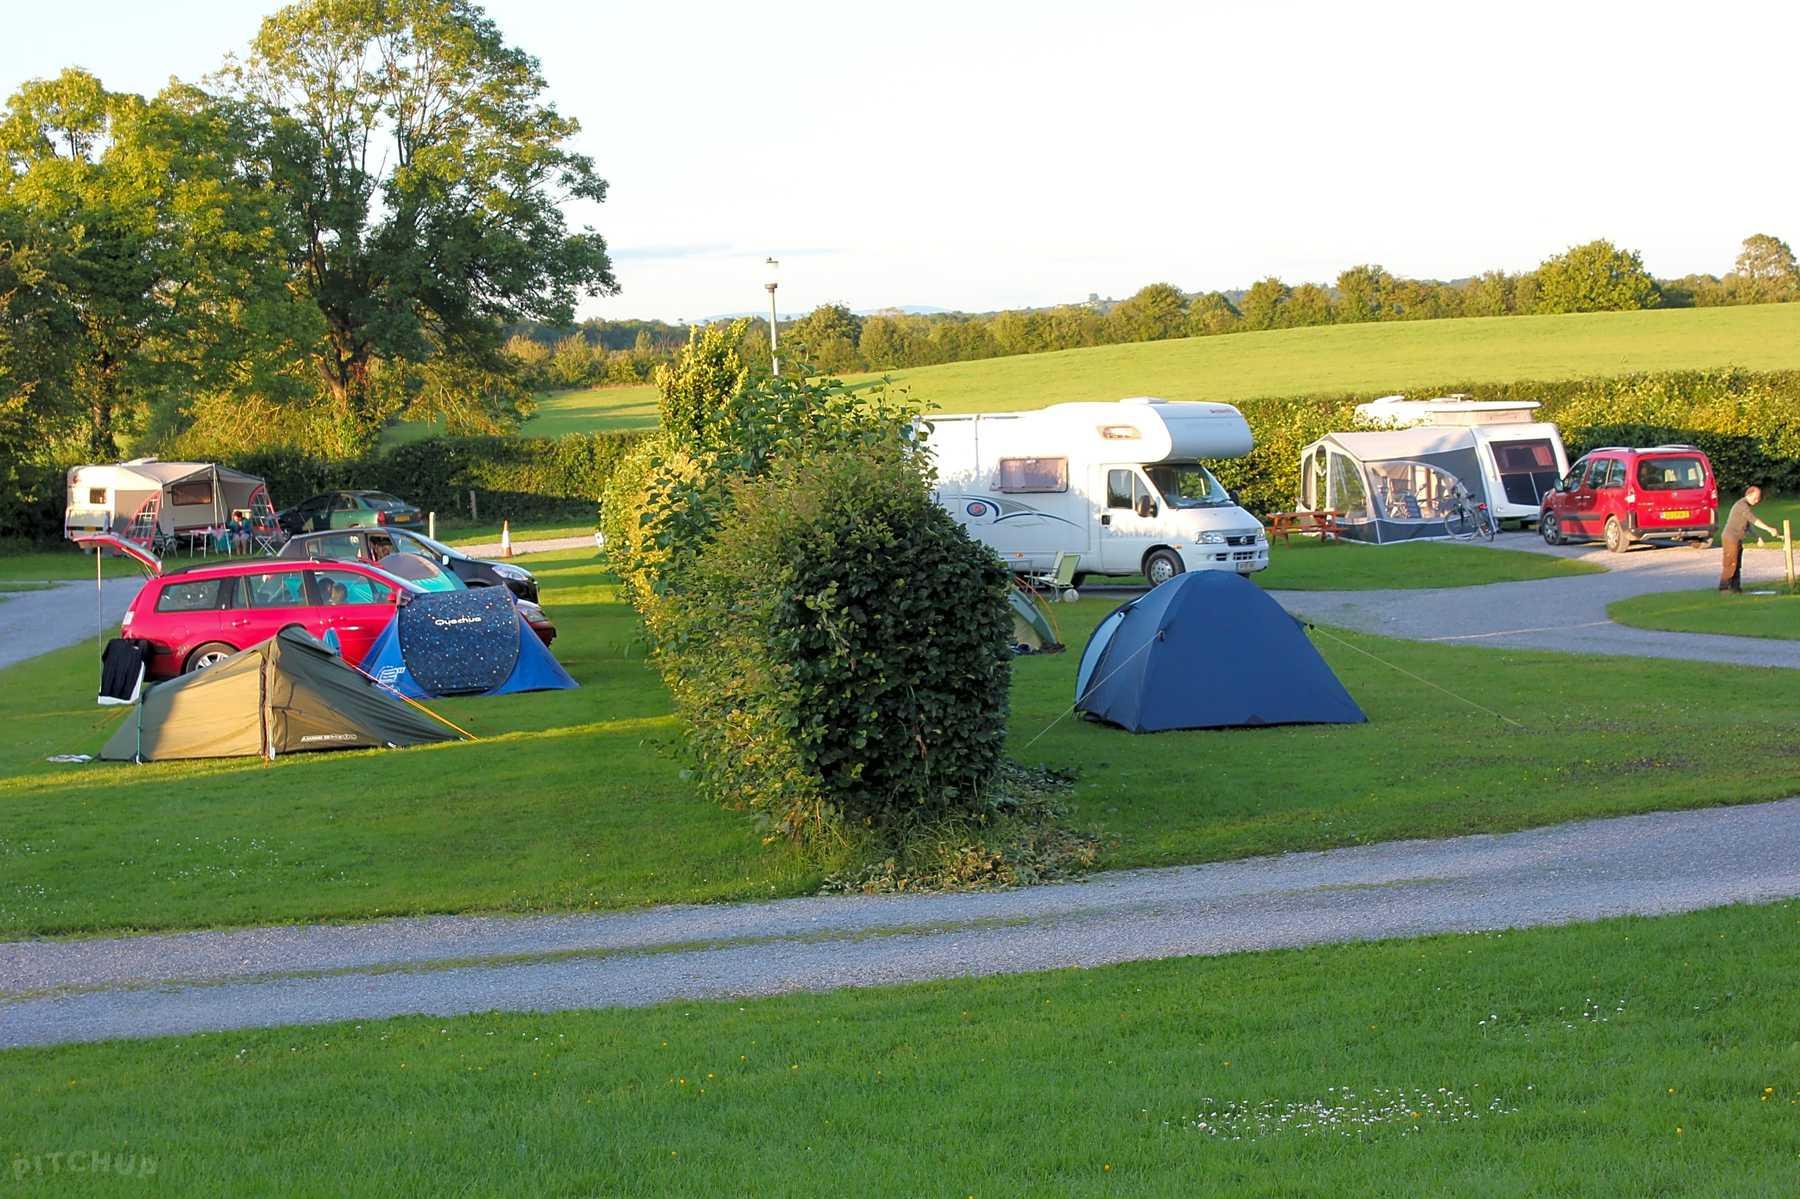 Camping Sites - Teagasc